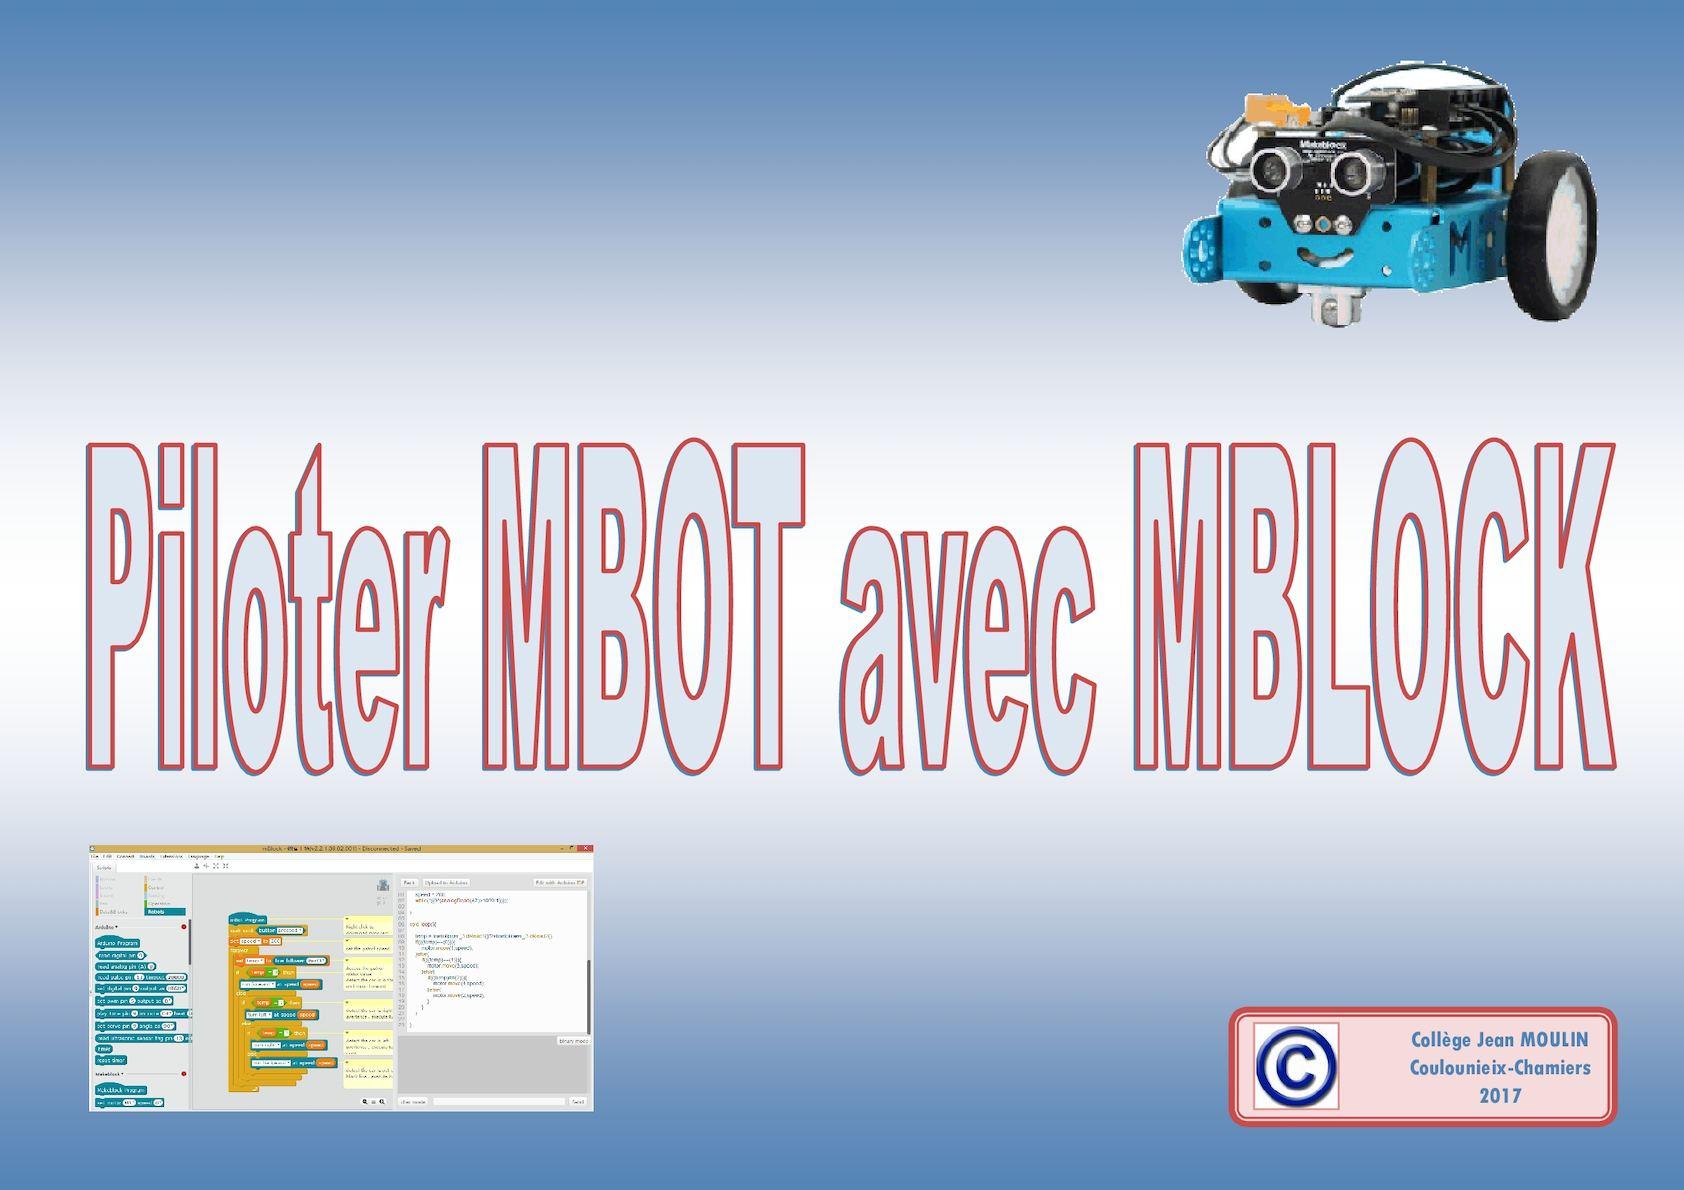 Piloter MBOT avec MBLOCK